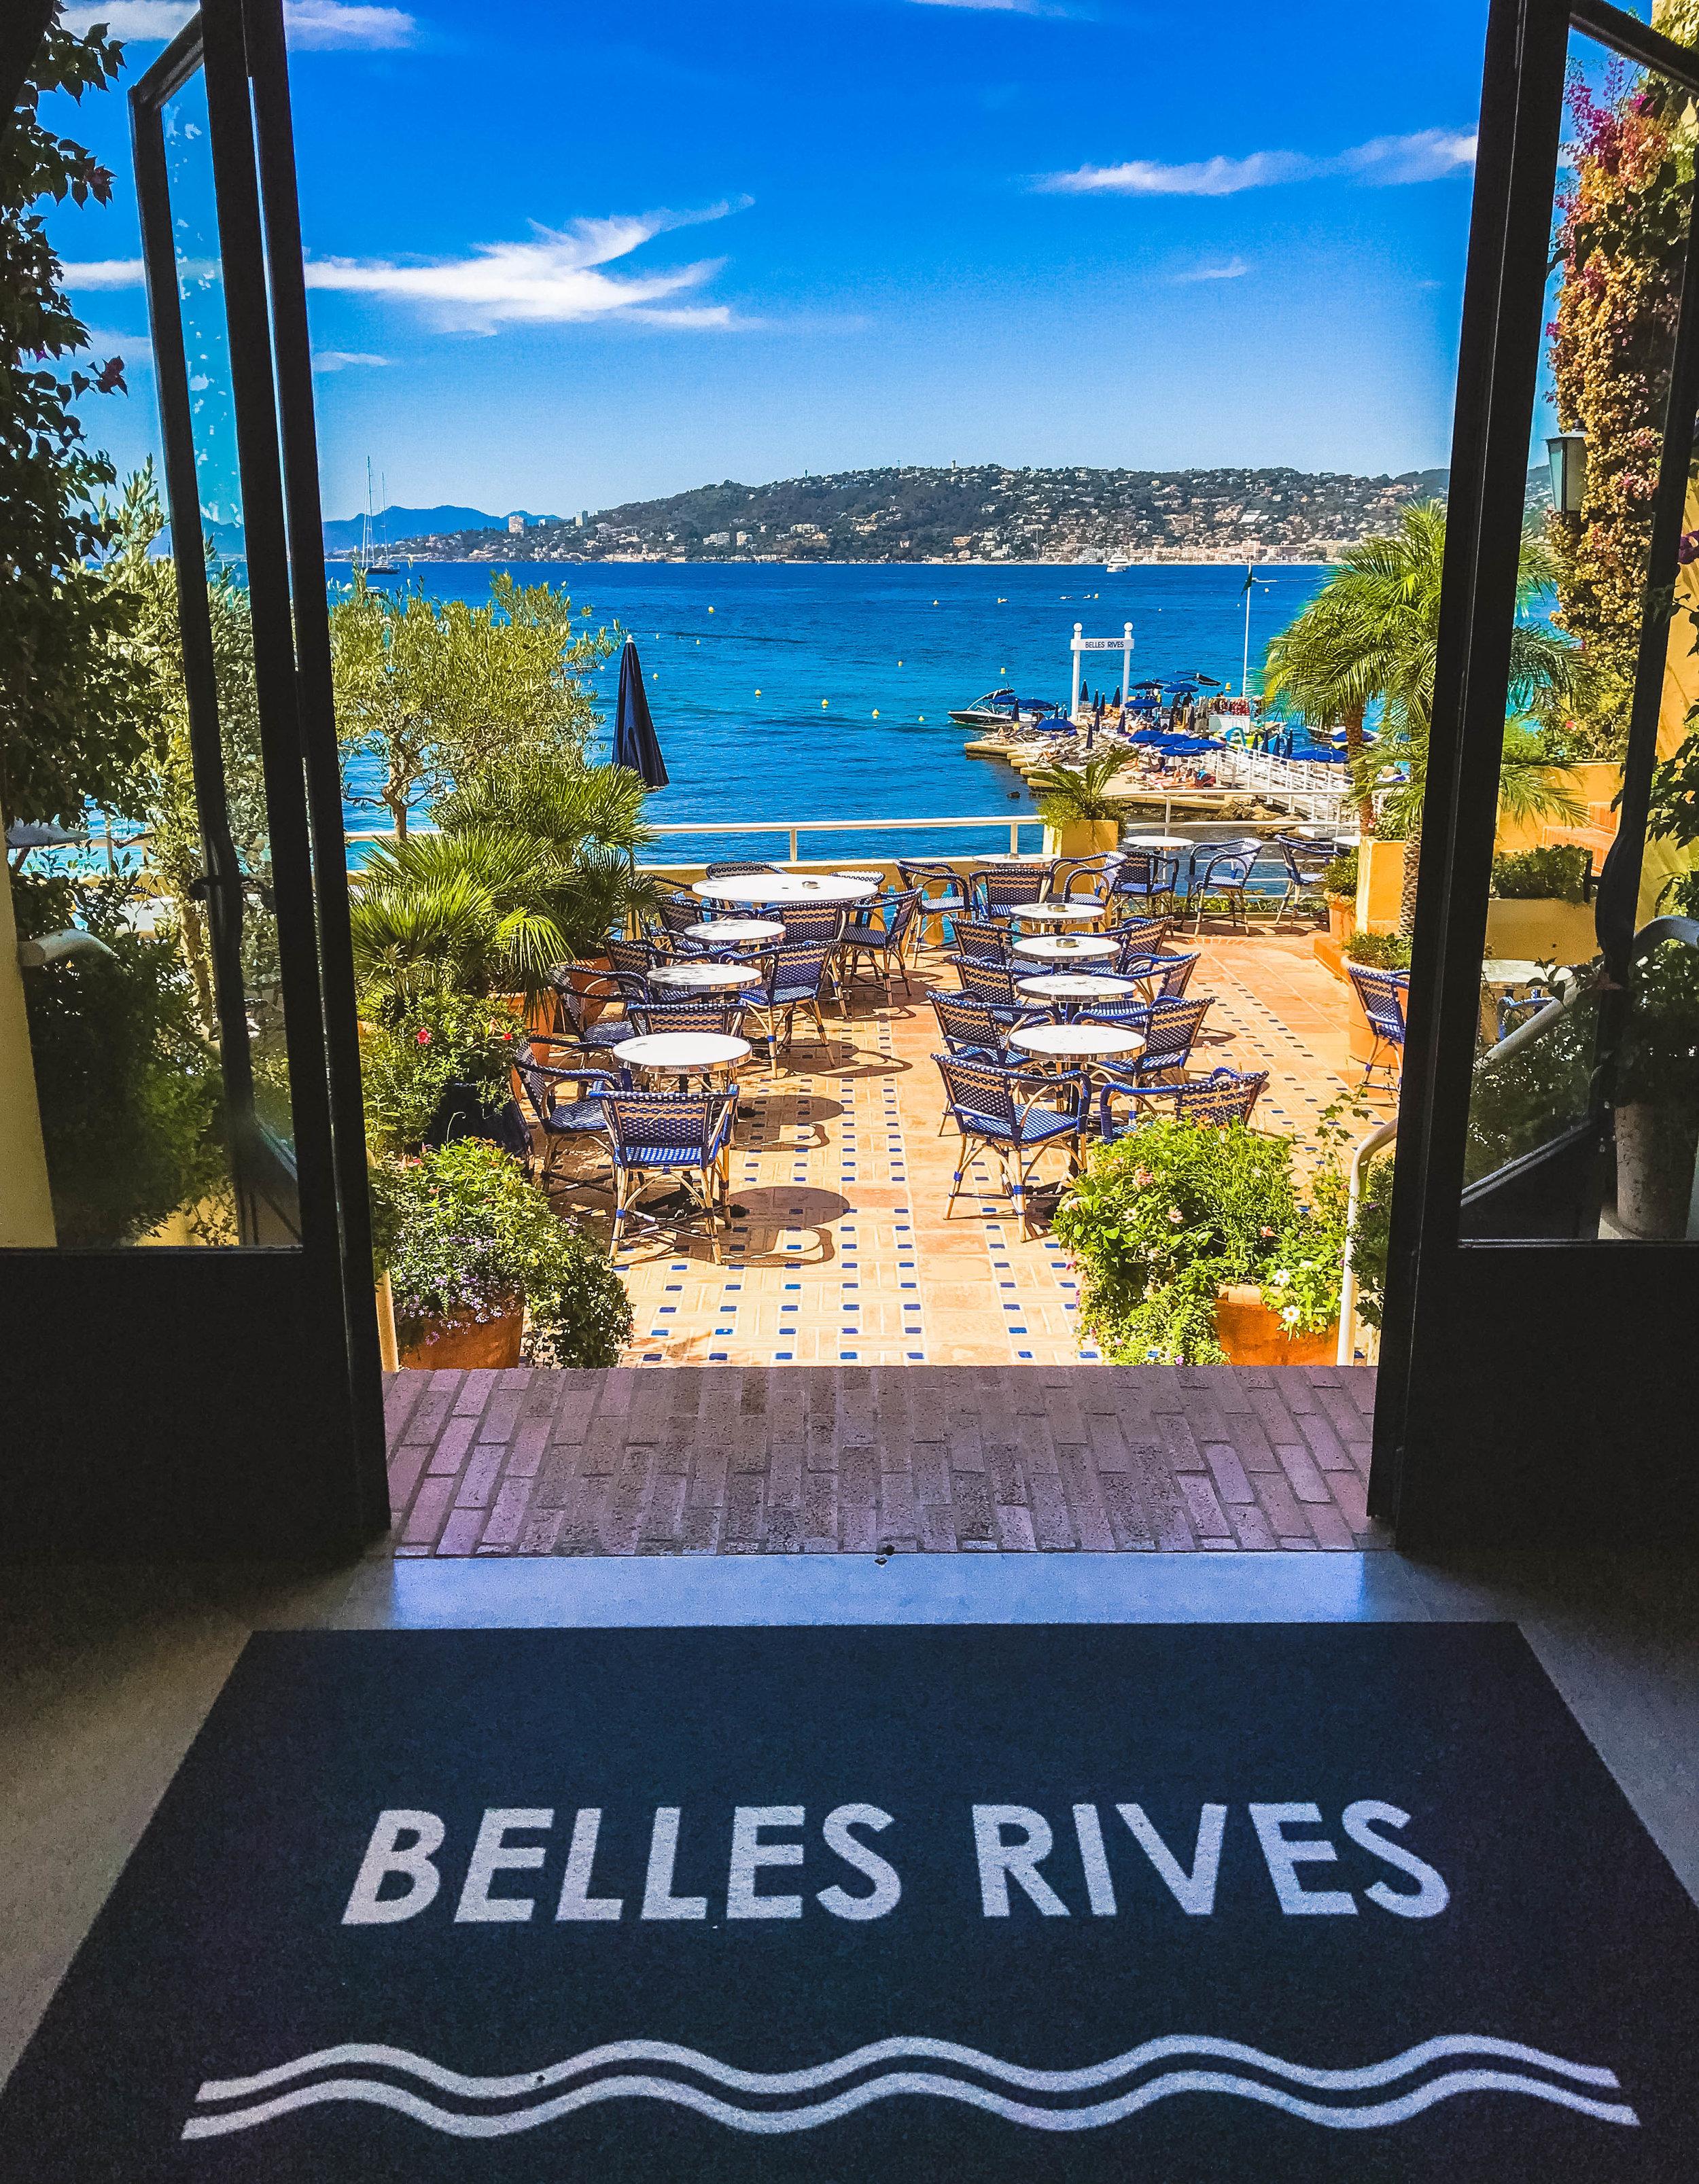 Hotel Belle Rives